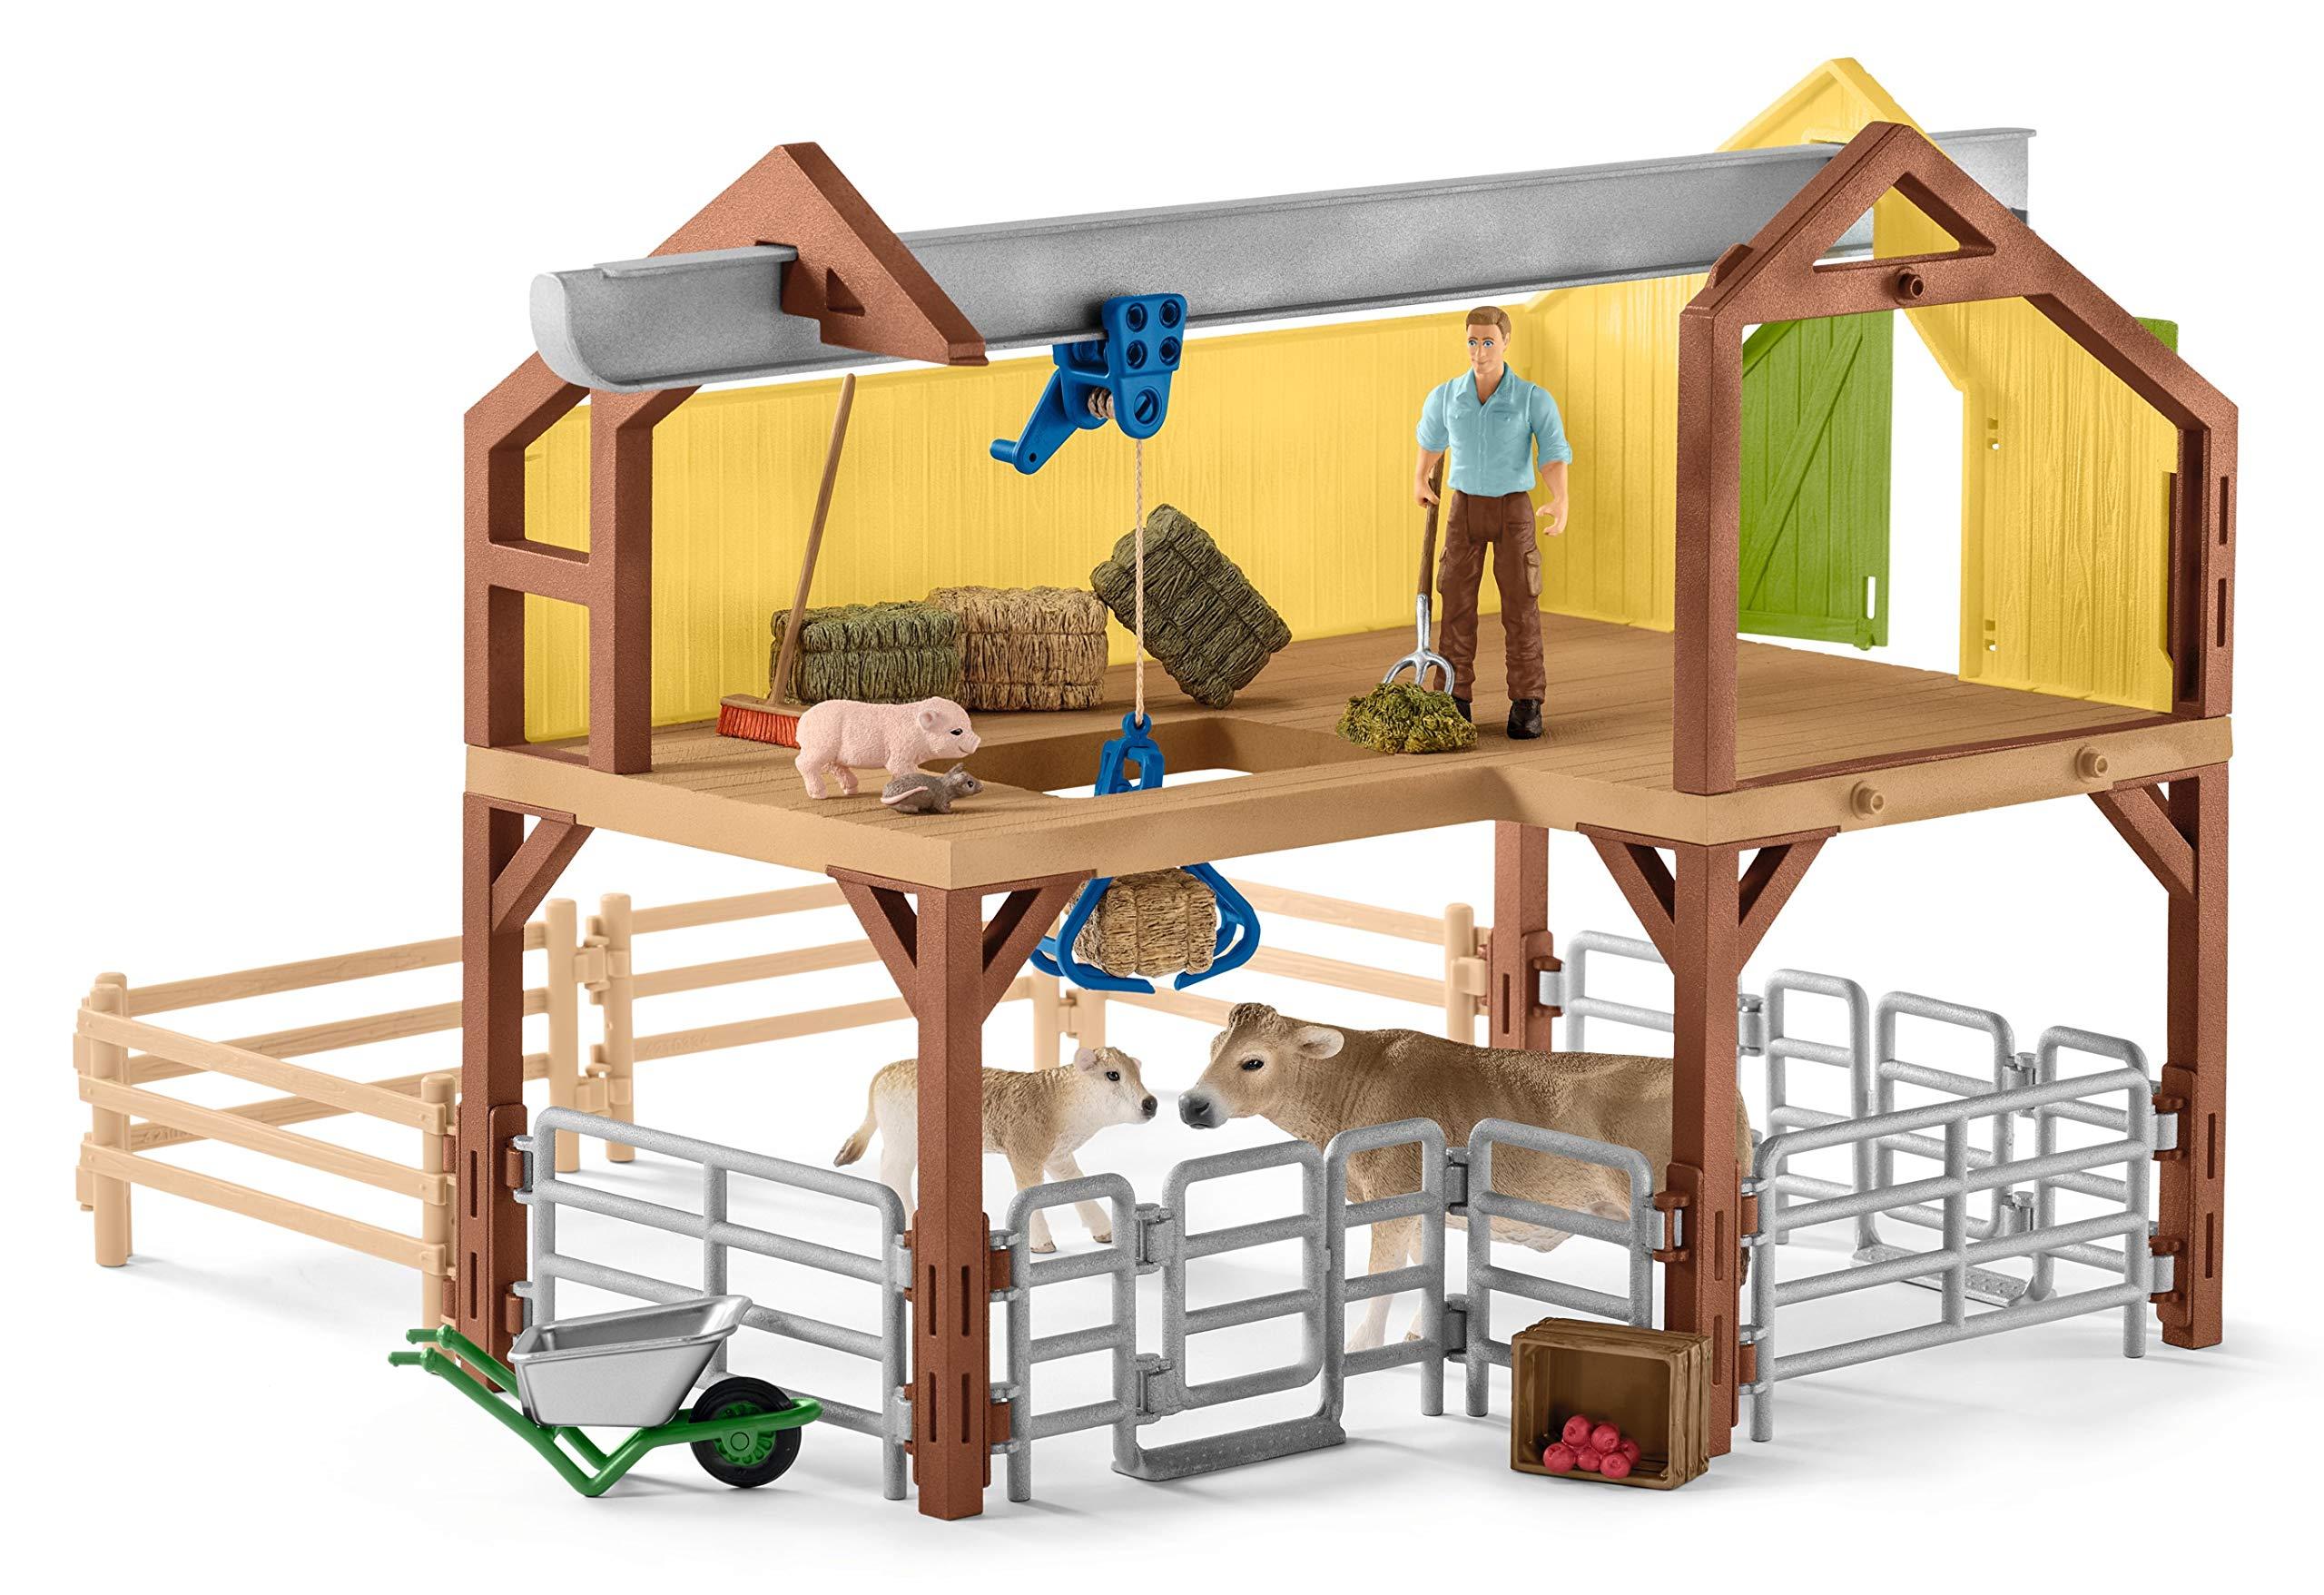 Schleich Large Farm House by Schleich (Image #3)